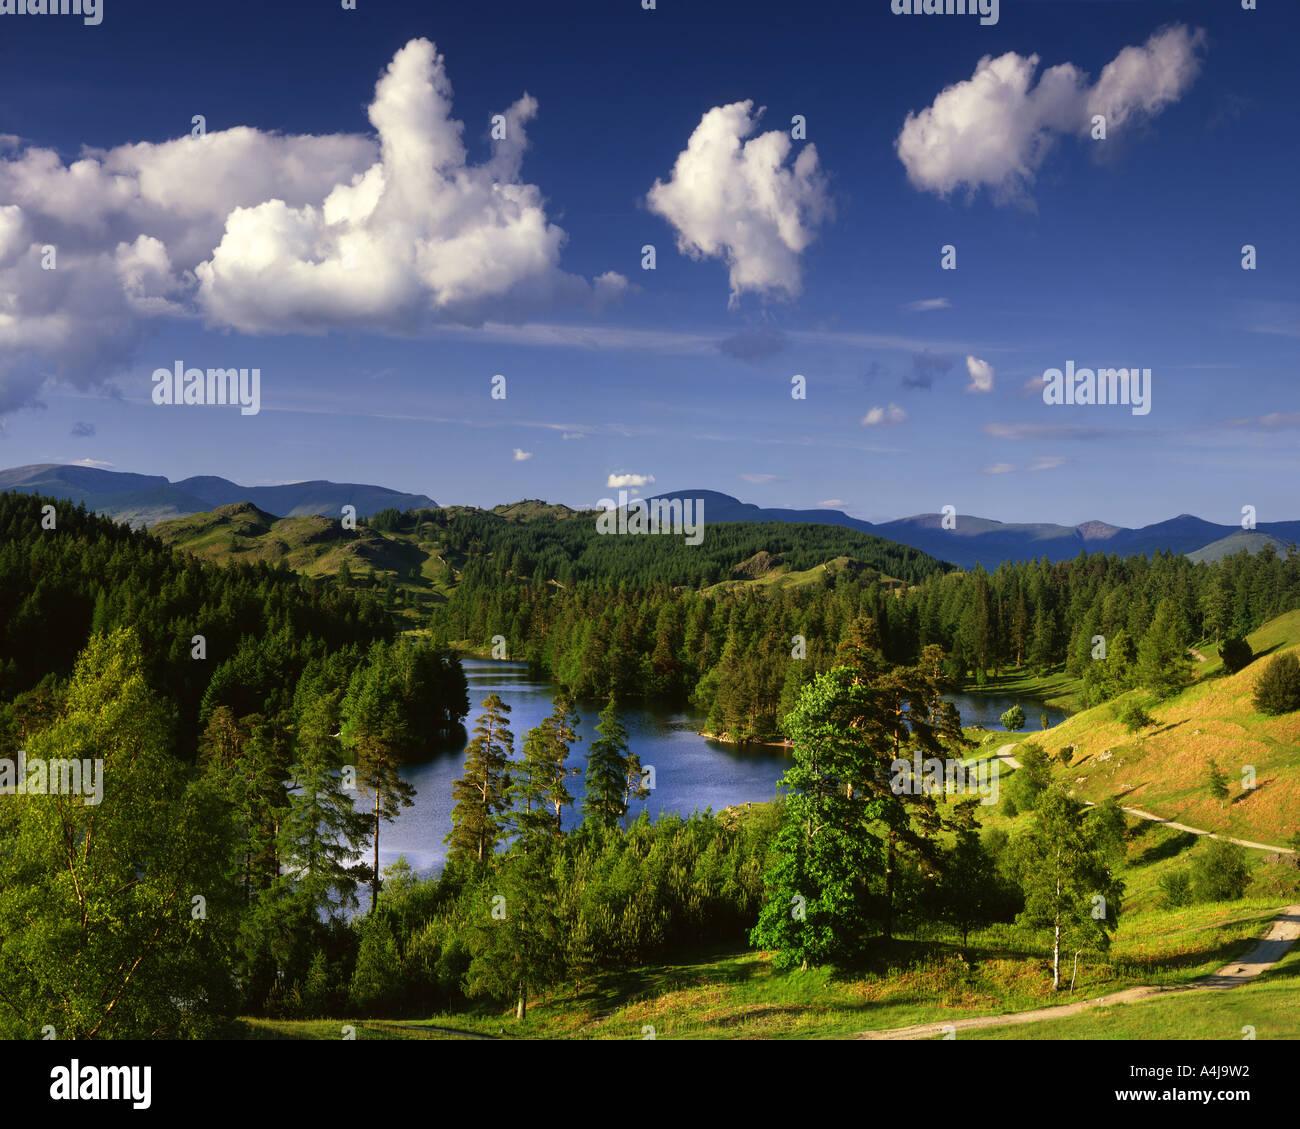 GB - CUMBRIA: Tarn Hows en el Lake District National Park Imagen De Stock